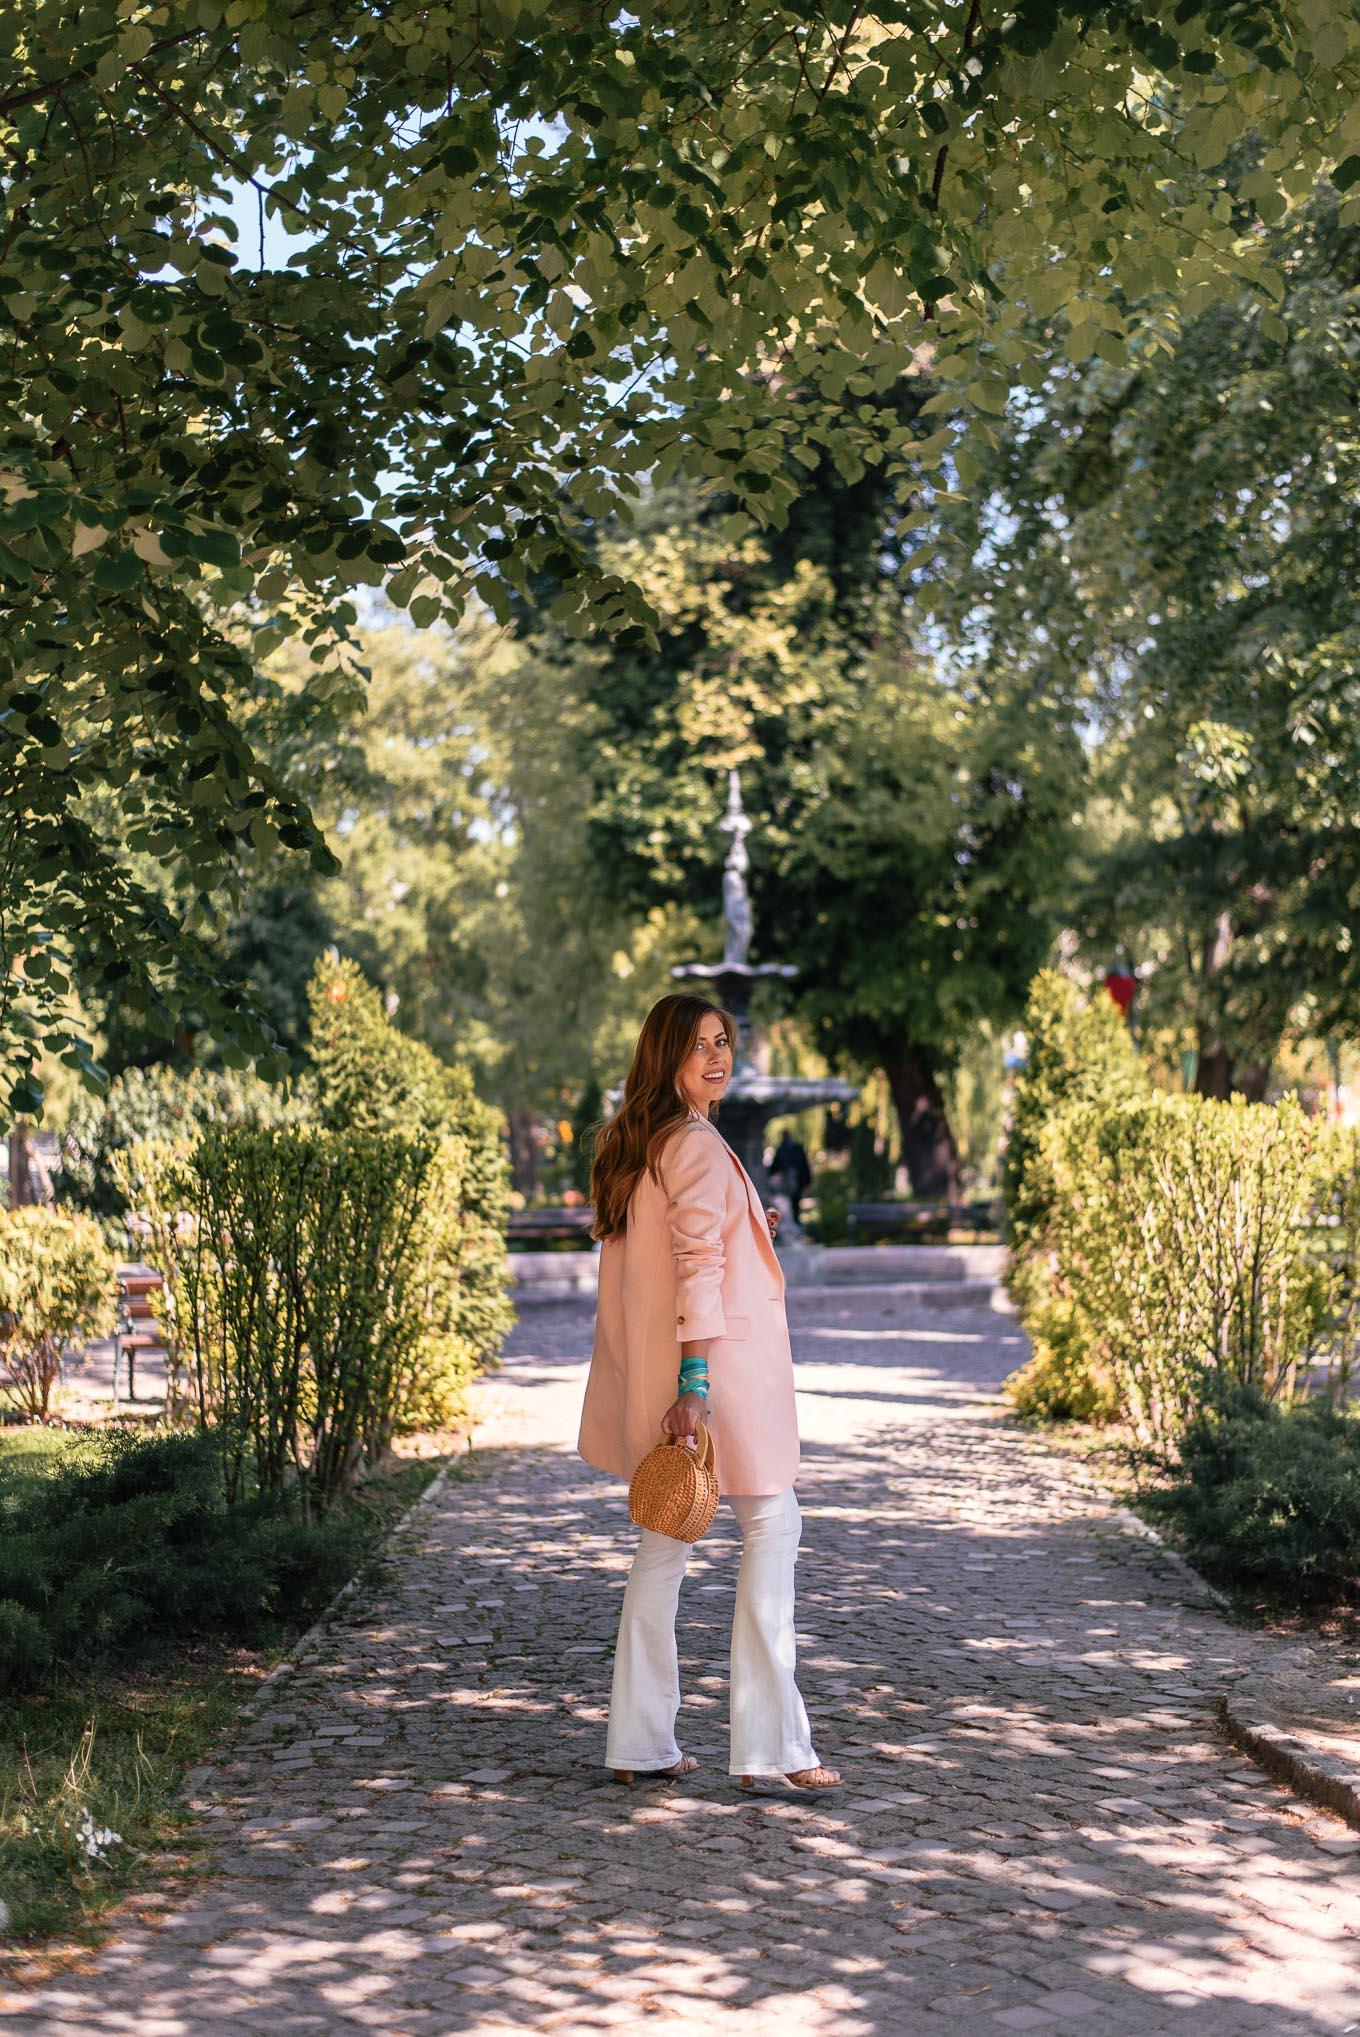 walking Plovidv central park